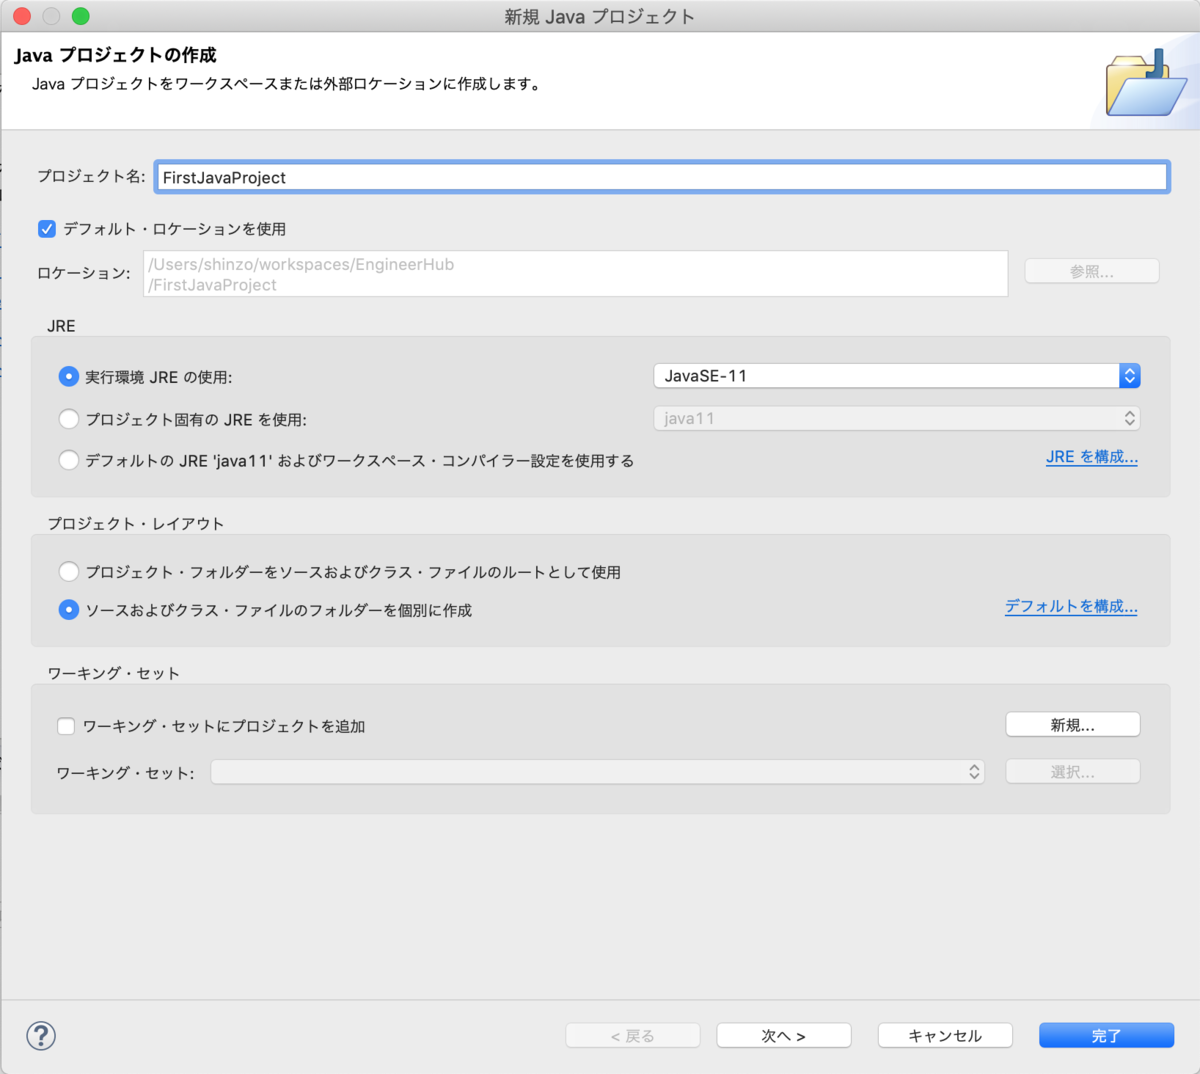 Javaプロジェクト作成ダイアログ